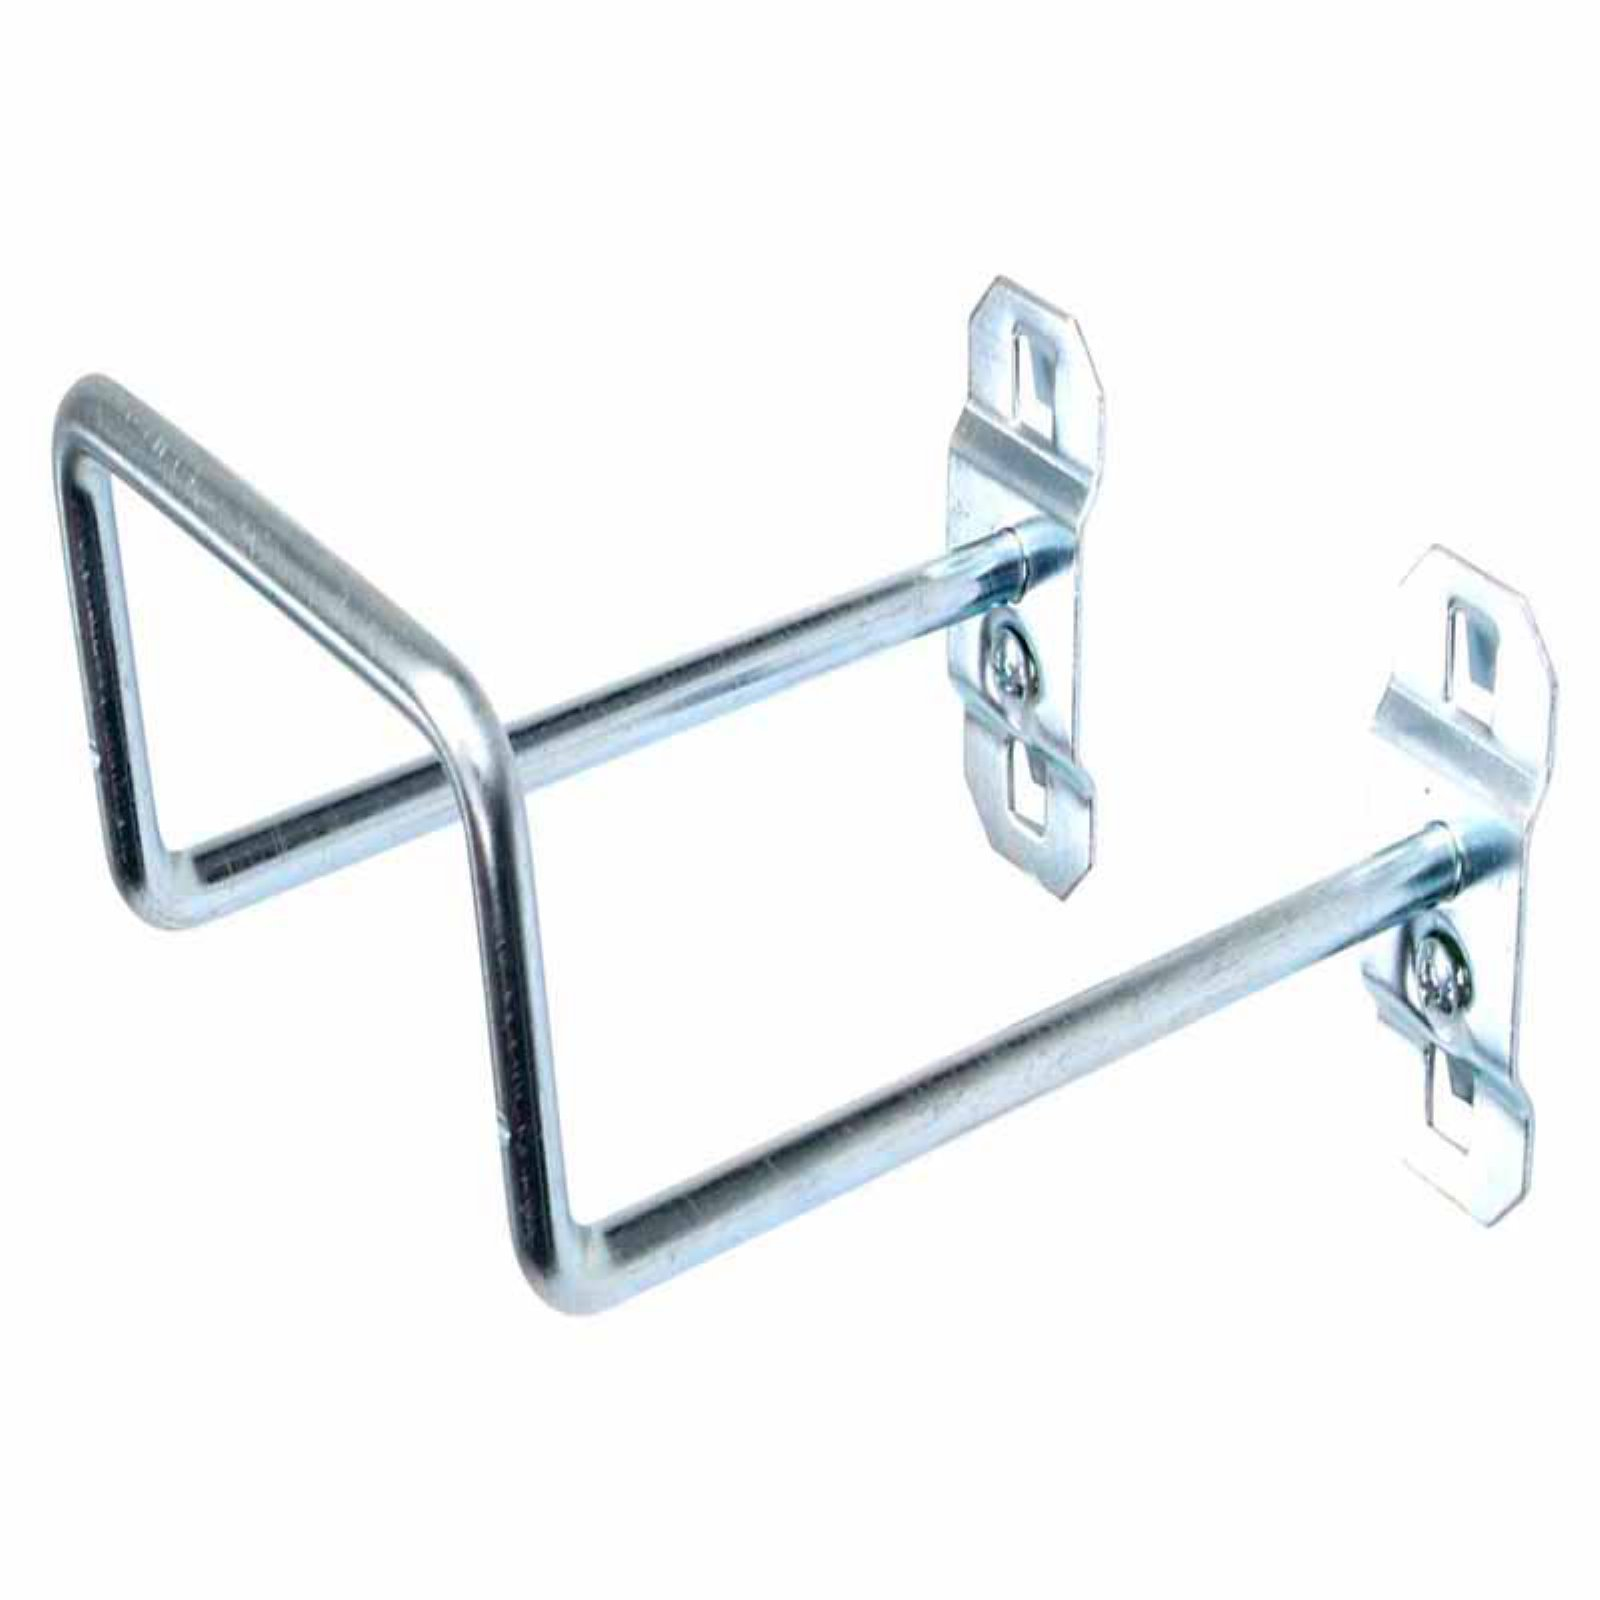 "LocHook 5"" 80-Degree Bend 2-3/4""ID Zinc Plated Steel Double Closed End Loop Pegboard Hook for LocBoard, 5pk"